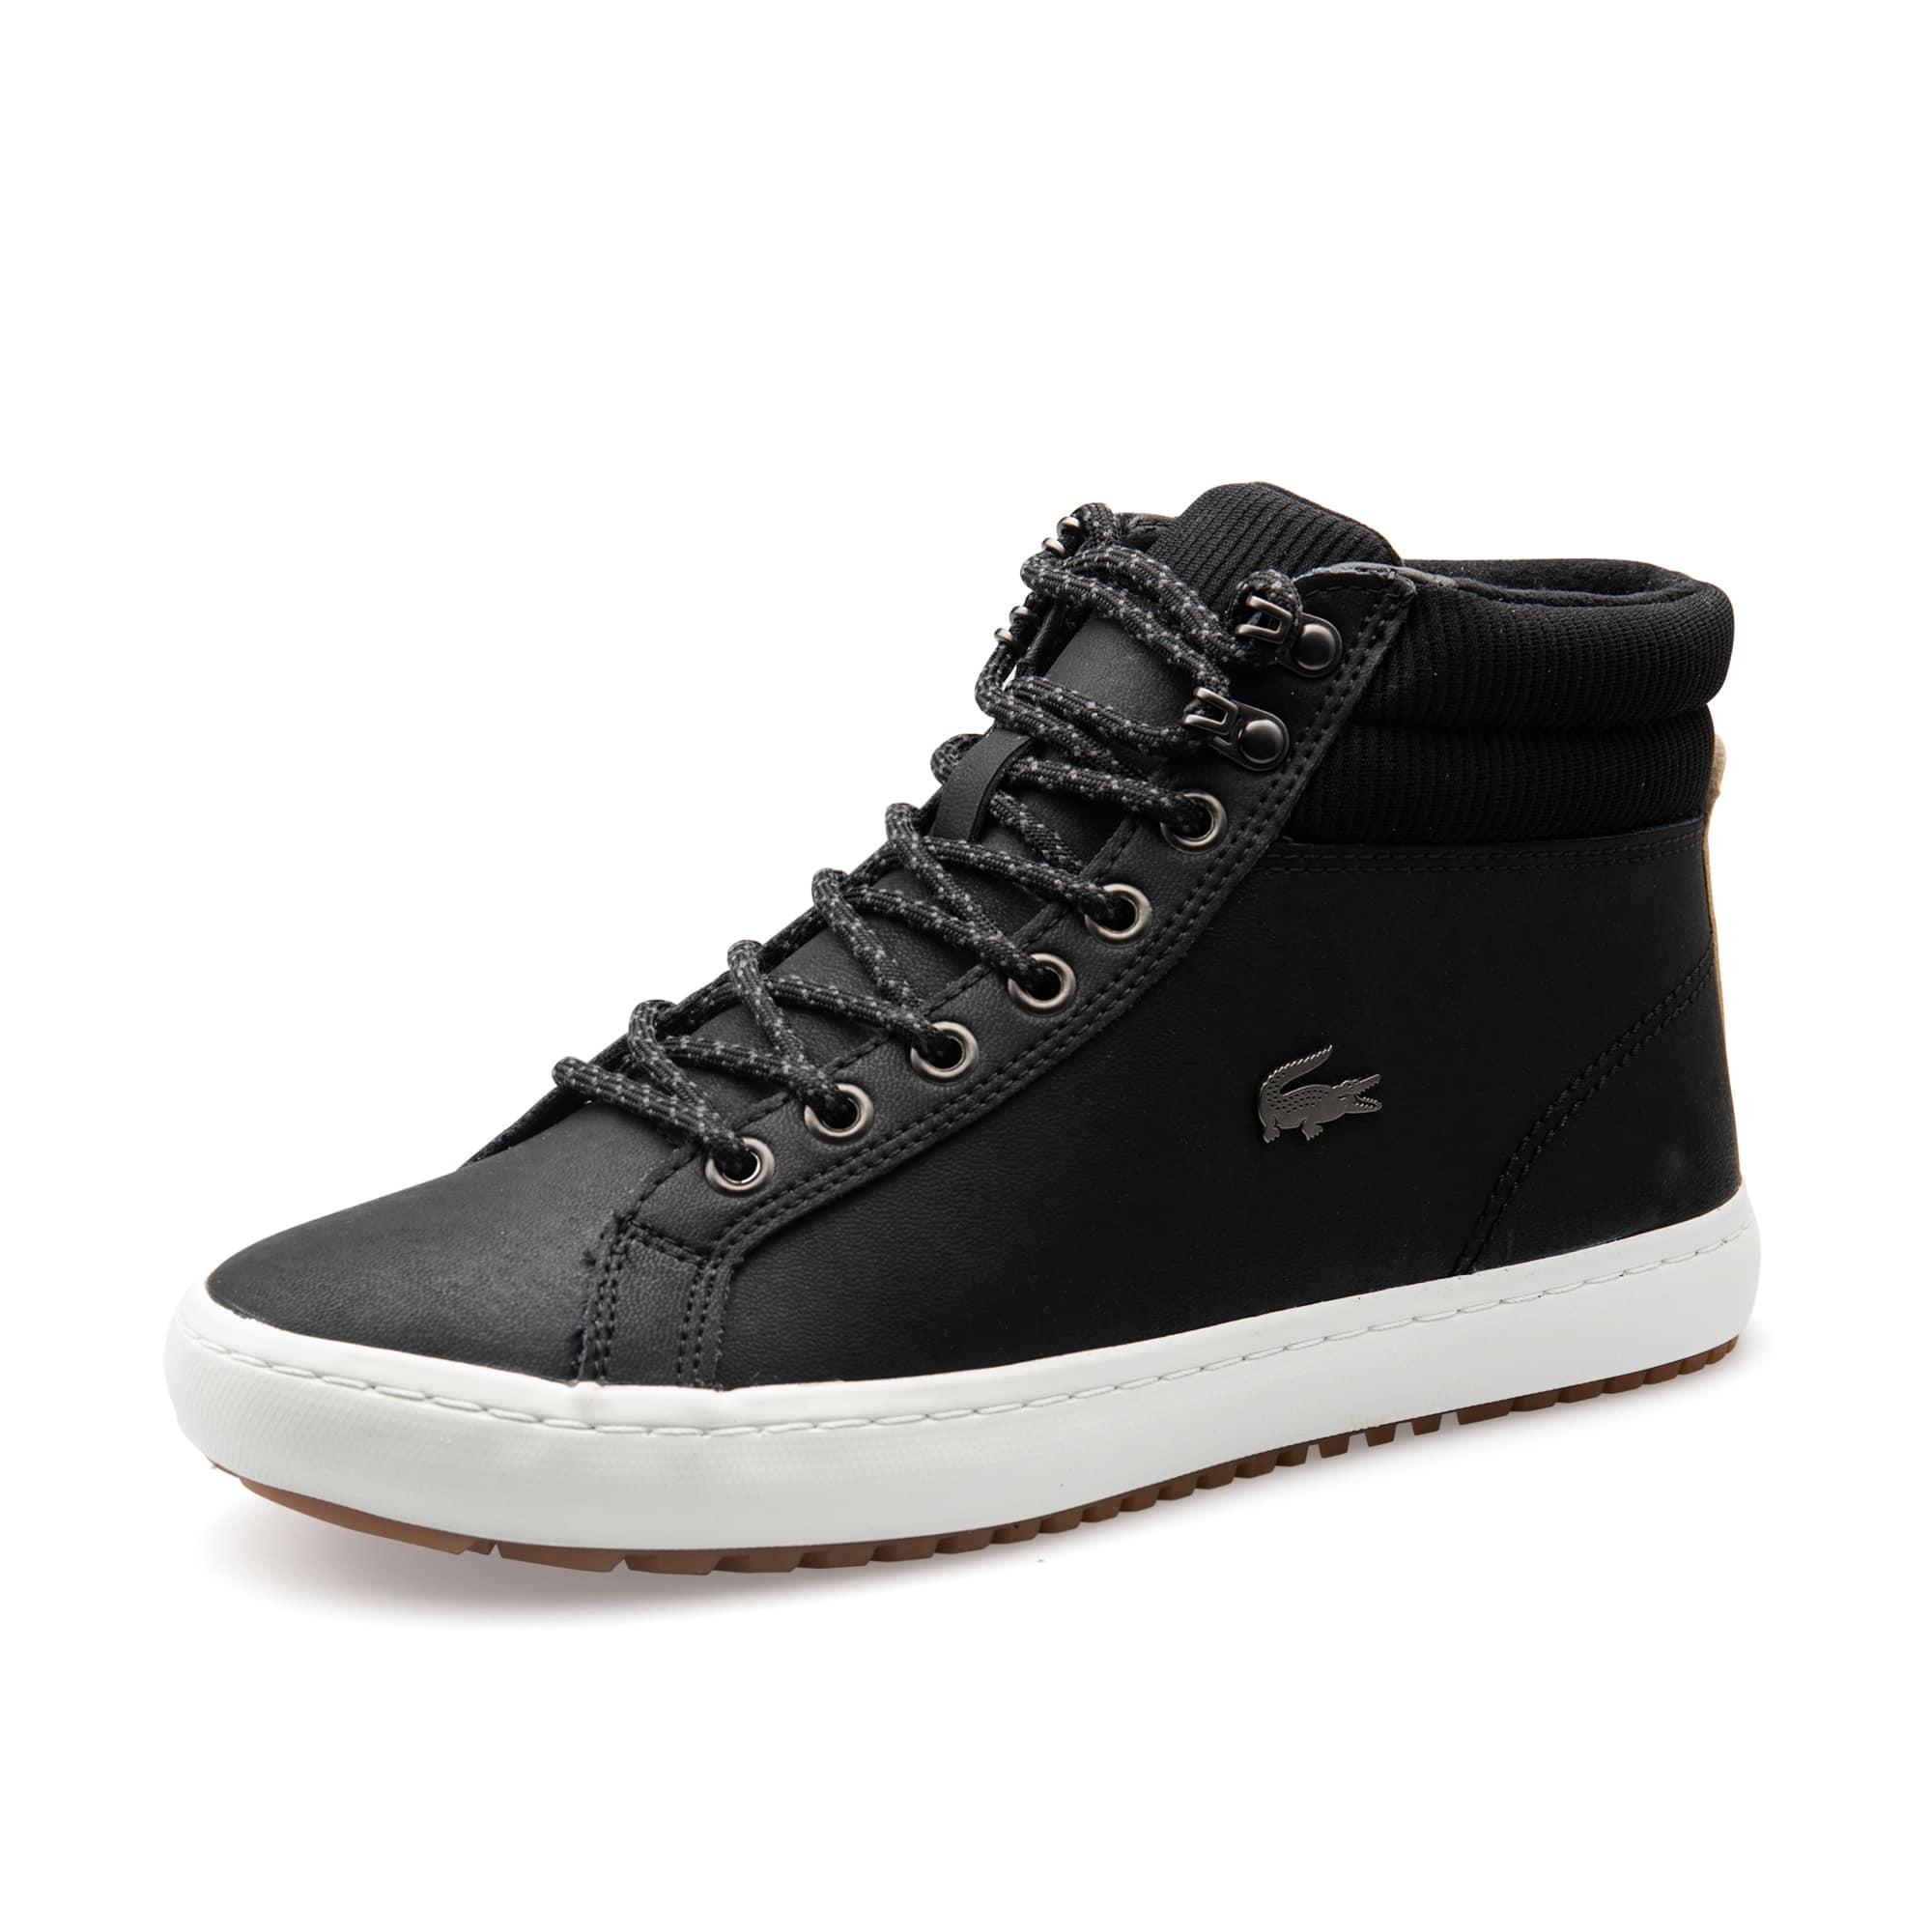 男士Straightset Insulac系列皮革和织物靴